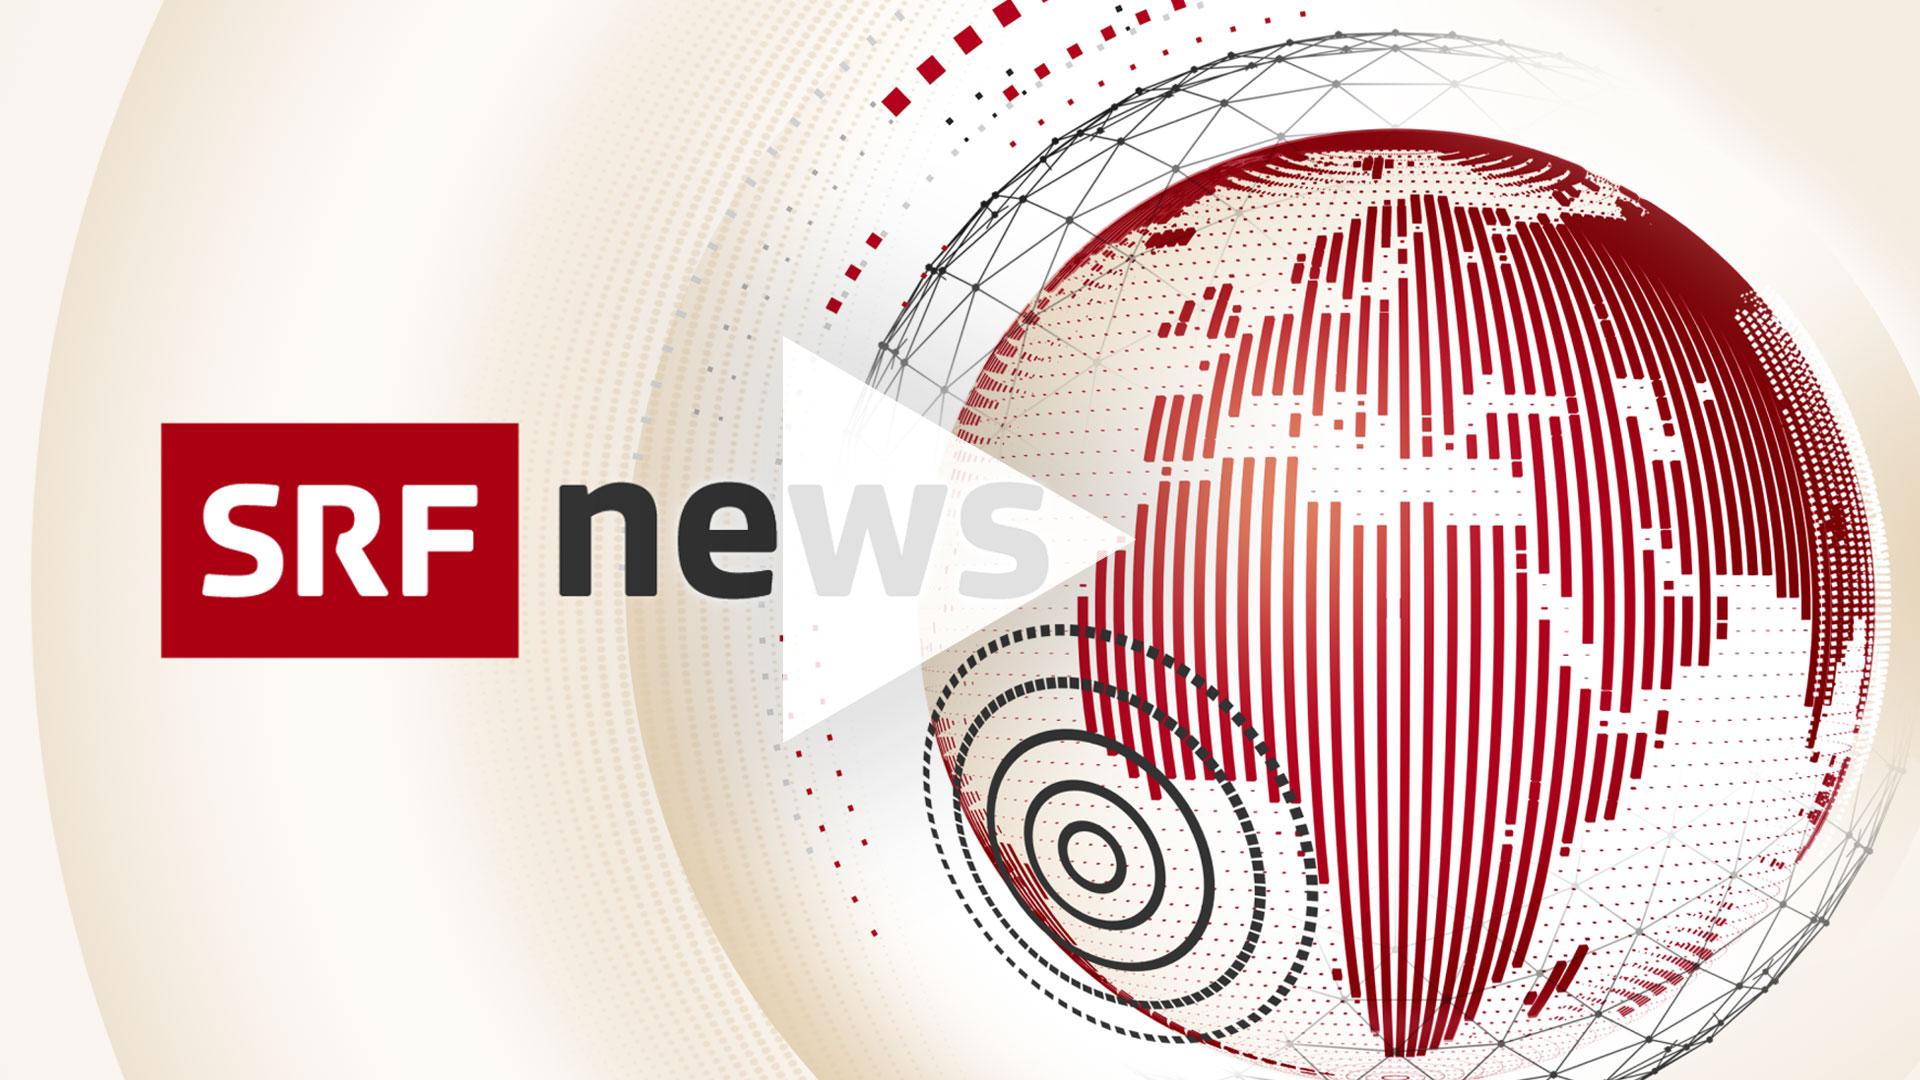 Pfeil-Thumbnail-SRF-News